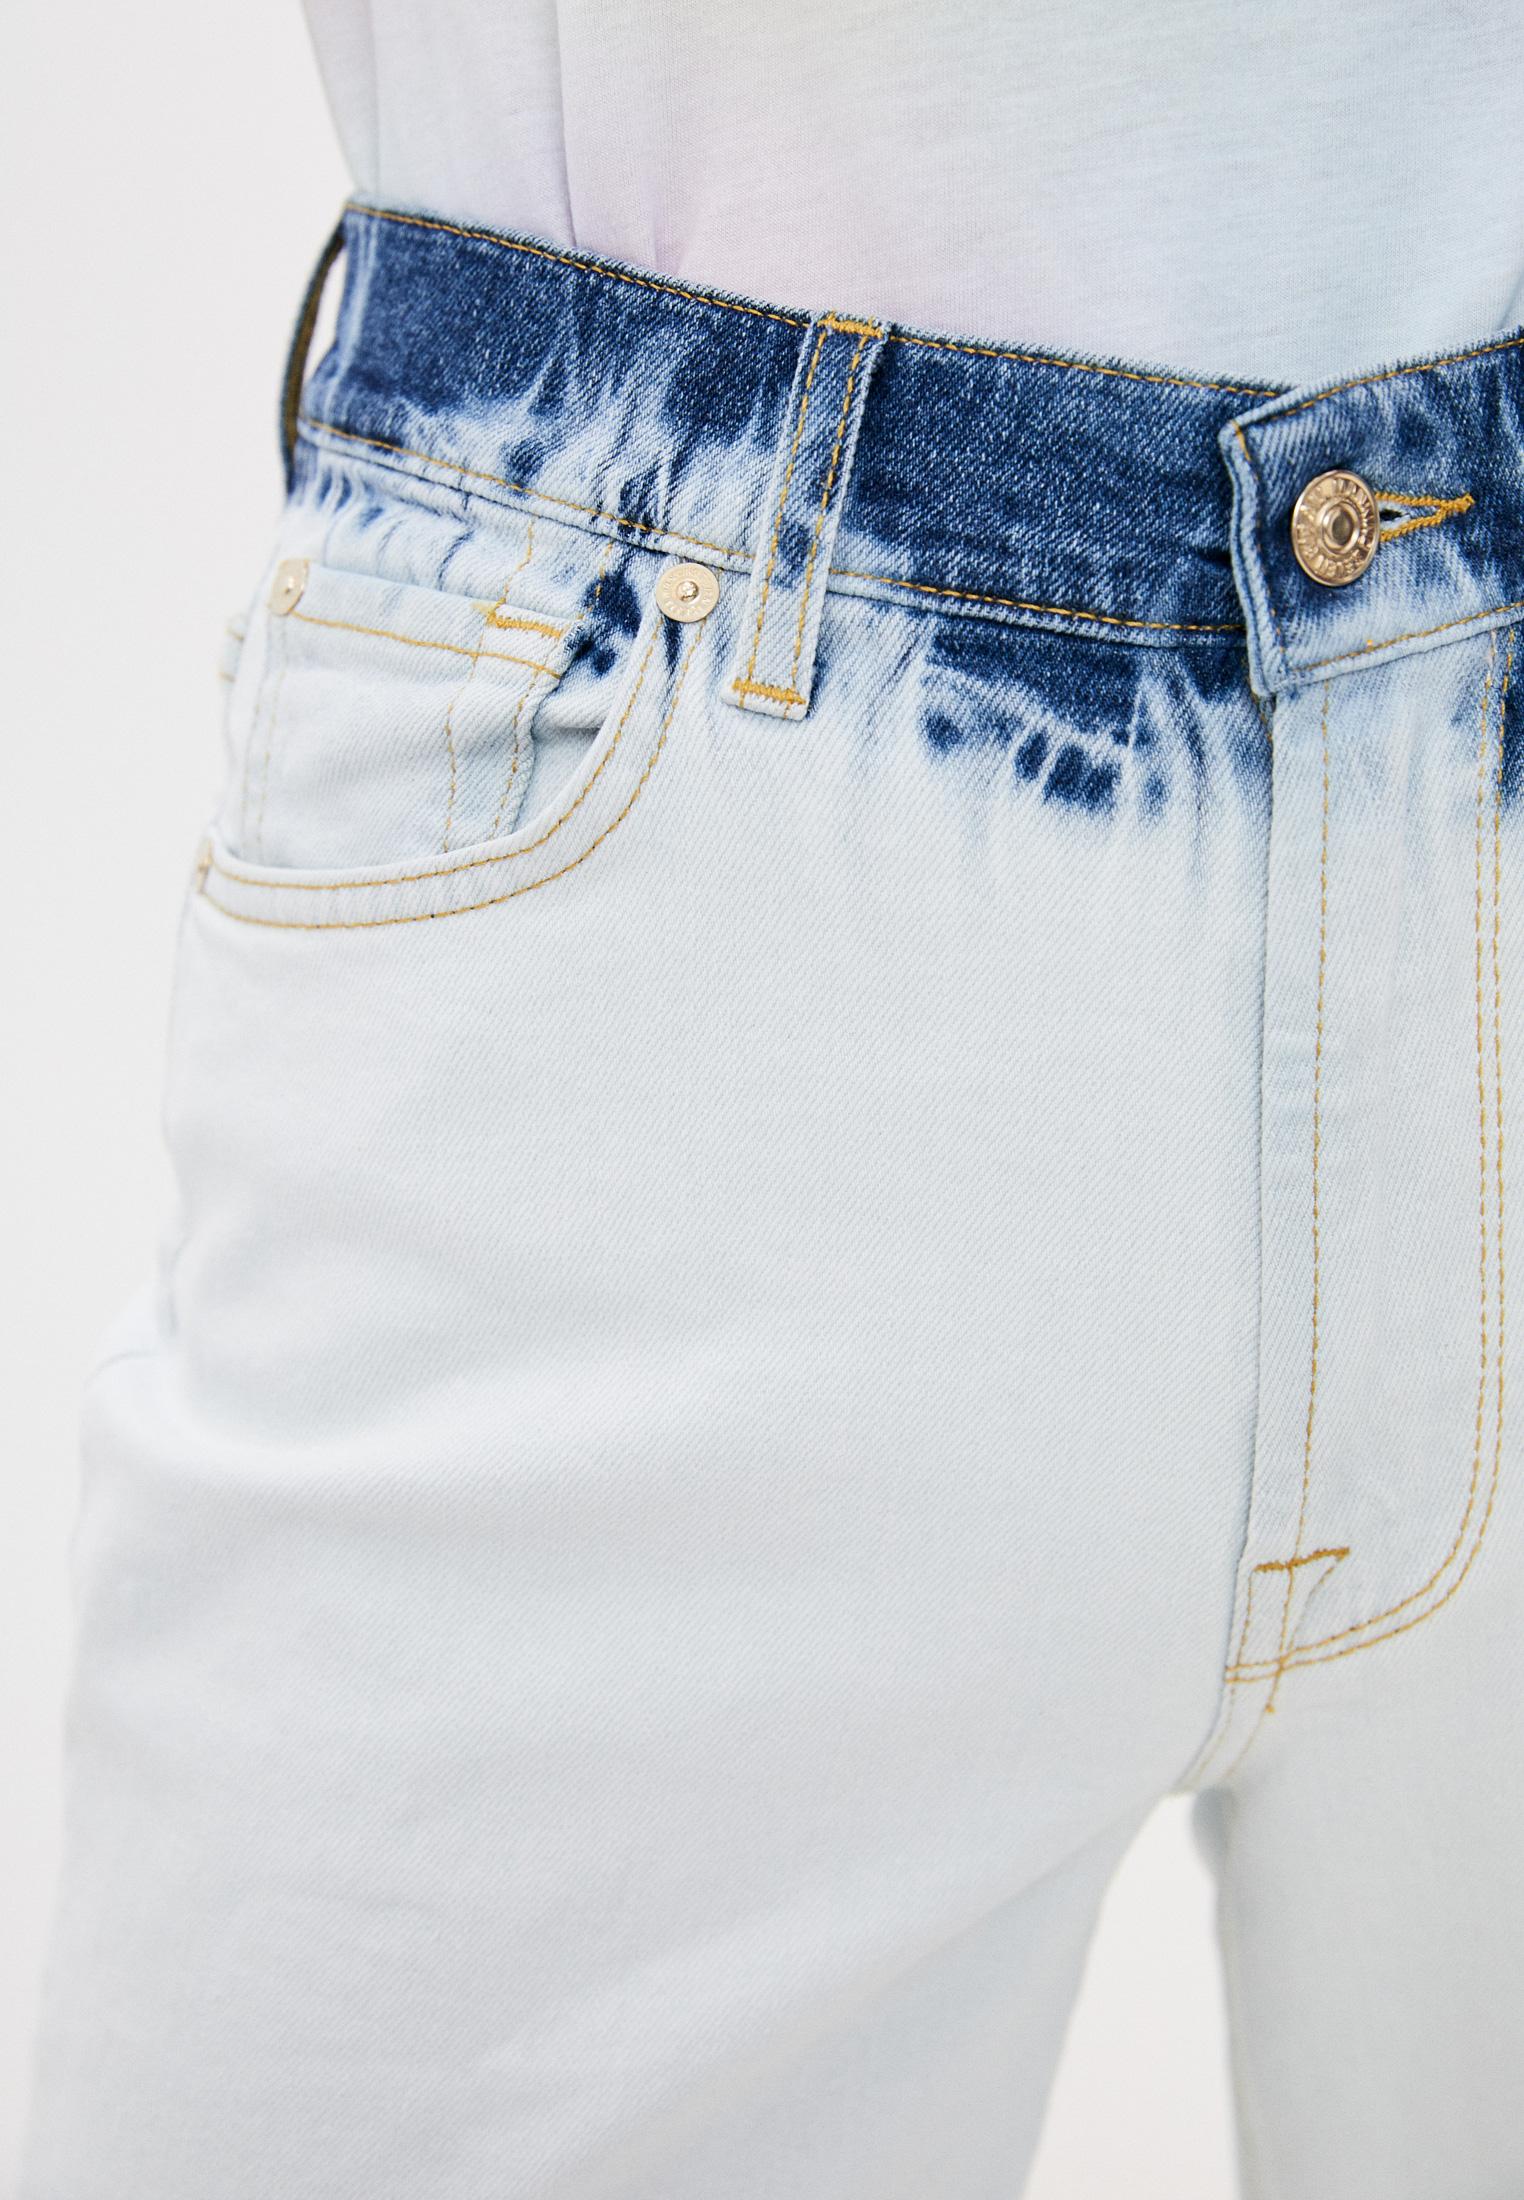 Прямые джинсы 7 For All Mankind (7 Фо Олл Мэнкайнд) JSA7B610HT: изображение 3